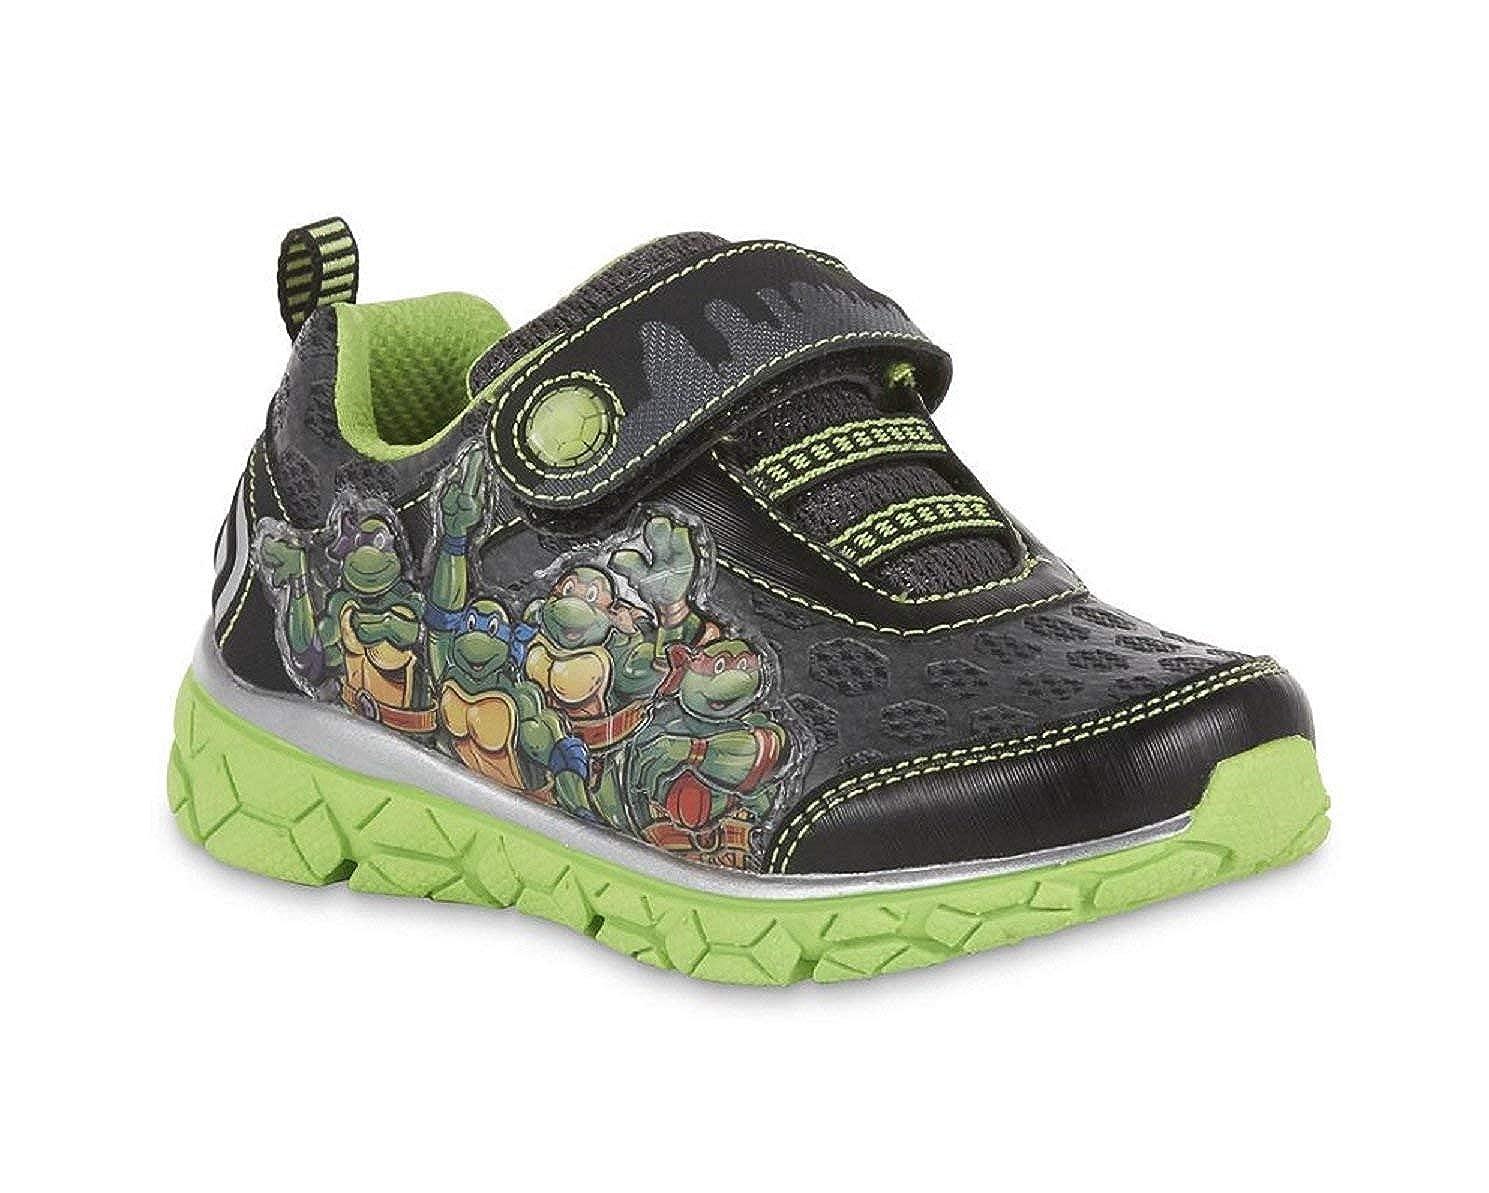 Nickelodeon Toddler Boys' Teenage Mutant Ninja Turtles Sneaker, Light-Up